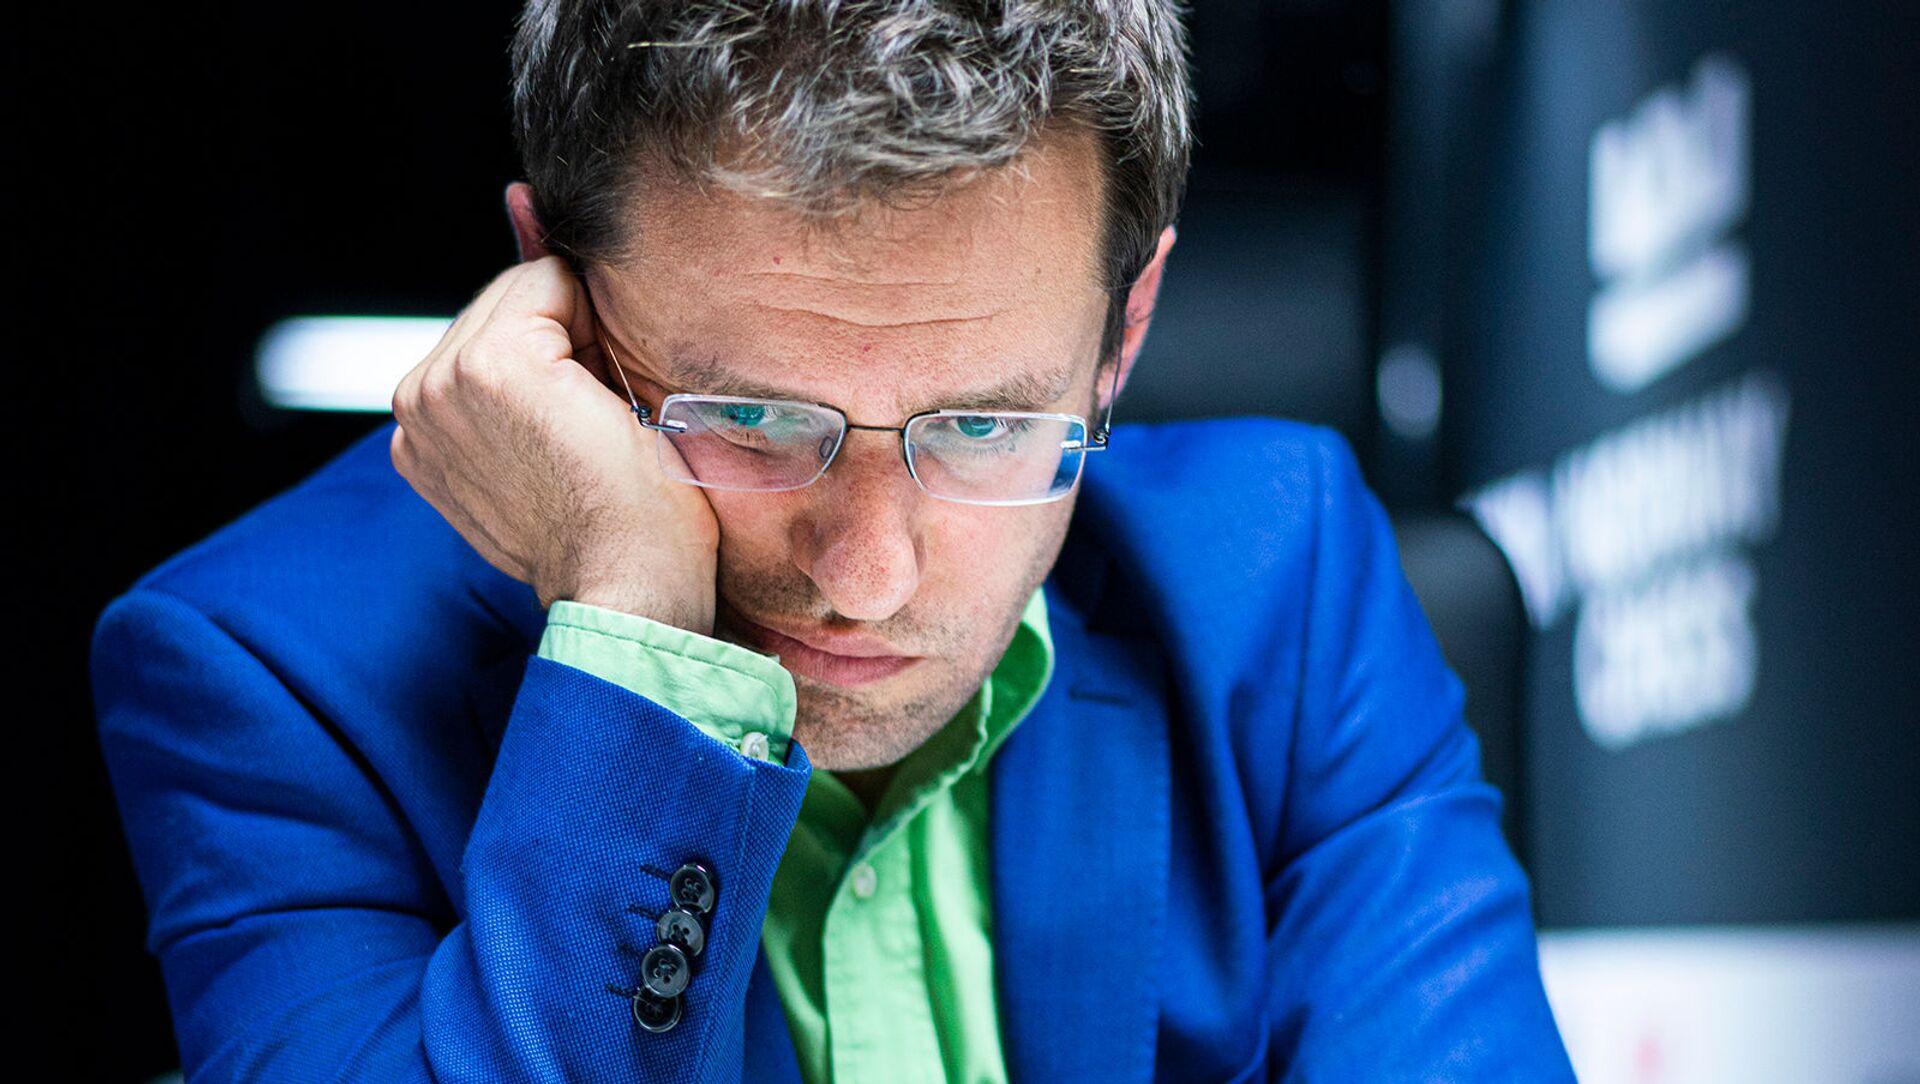 Гроссмейстер Левон Аронян во время партии с Магнусом Карлсеном в турнире Altibox Norway Chess 2019 (5 июня 2019). Ставангер, Норвегия - Sputnik Արմենիա, 1920, 03.08.2021